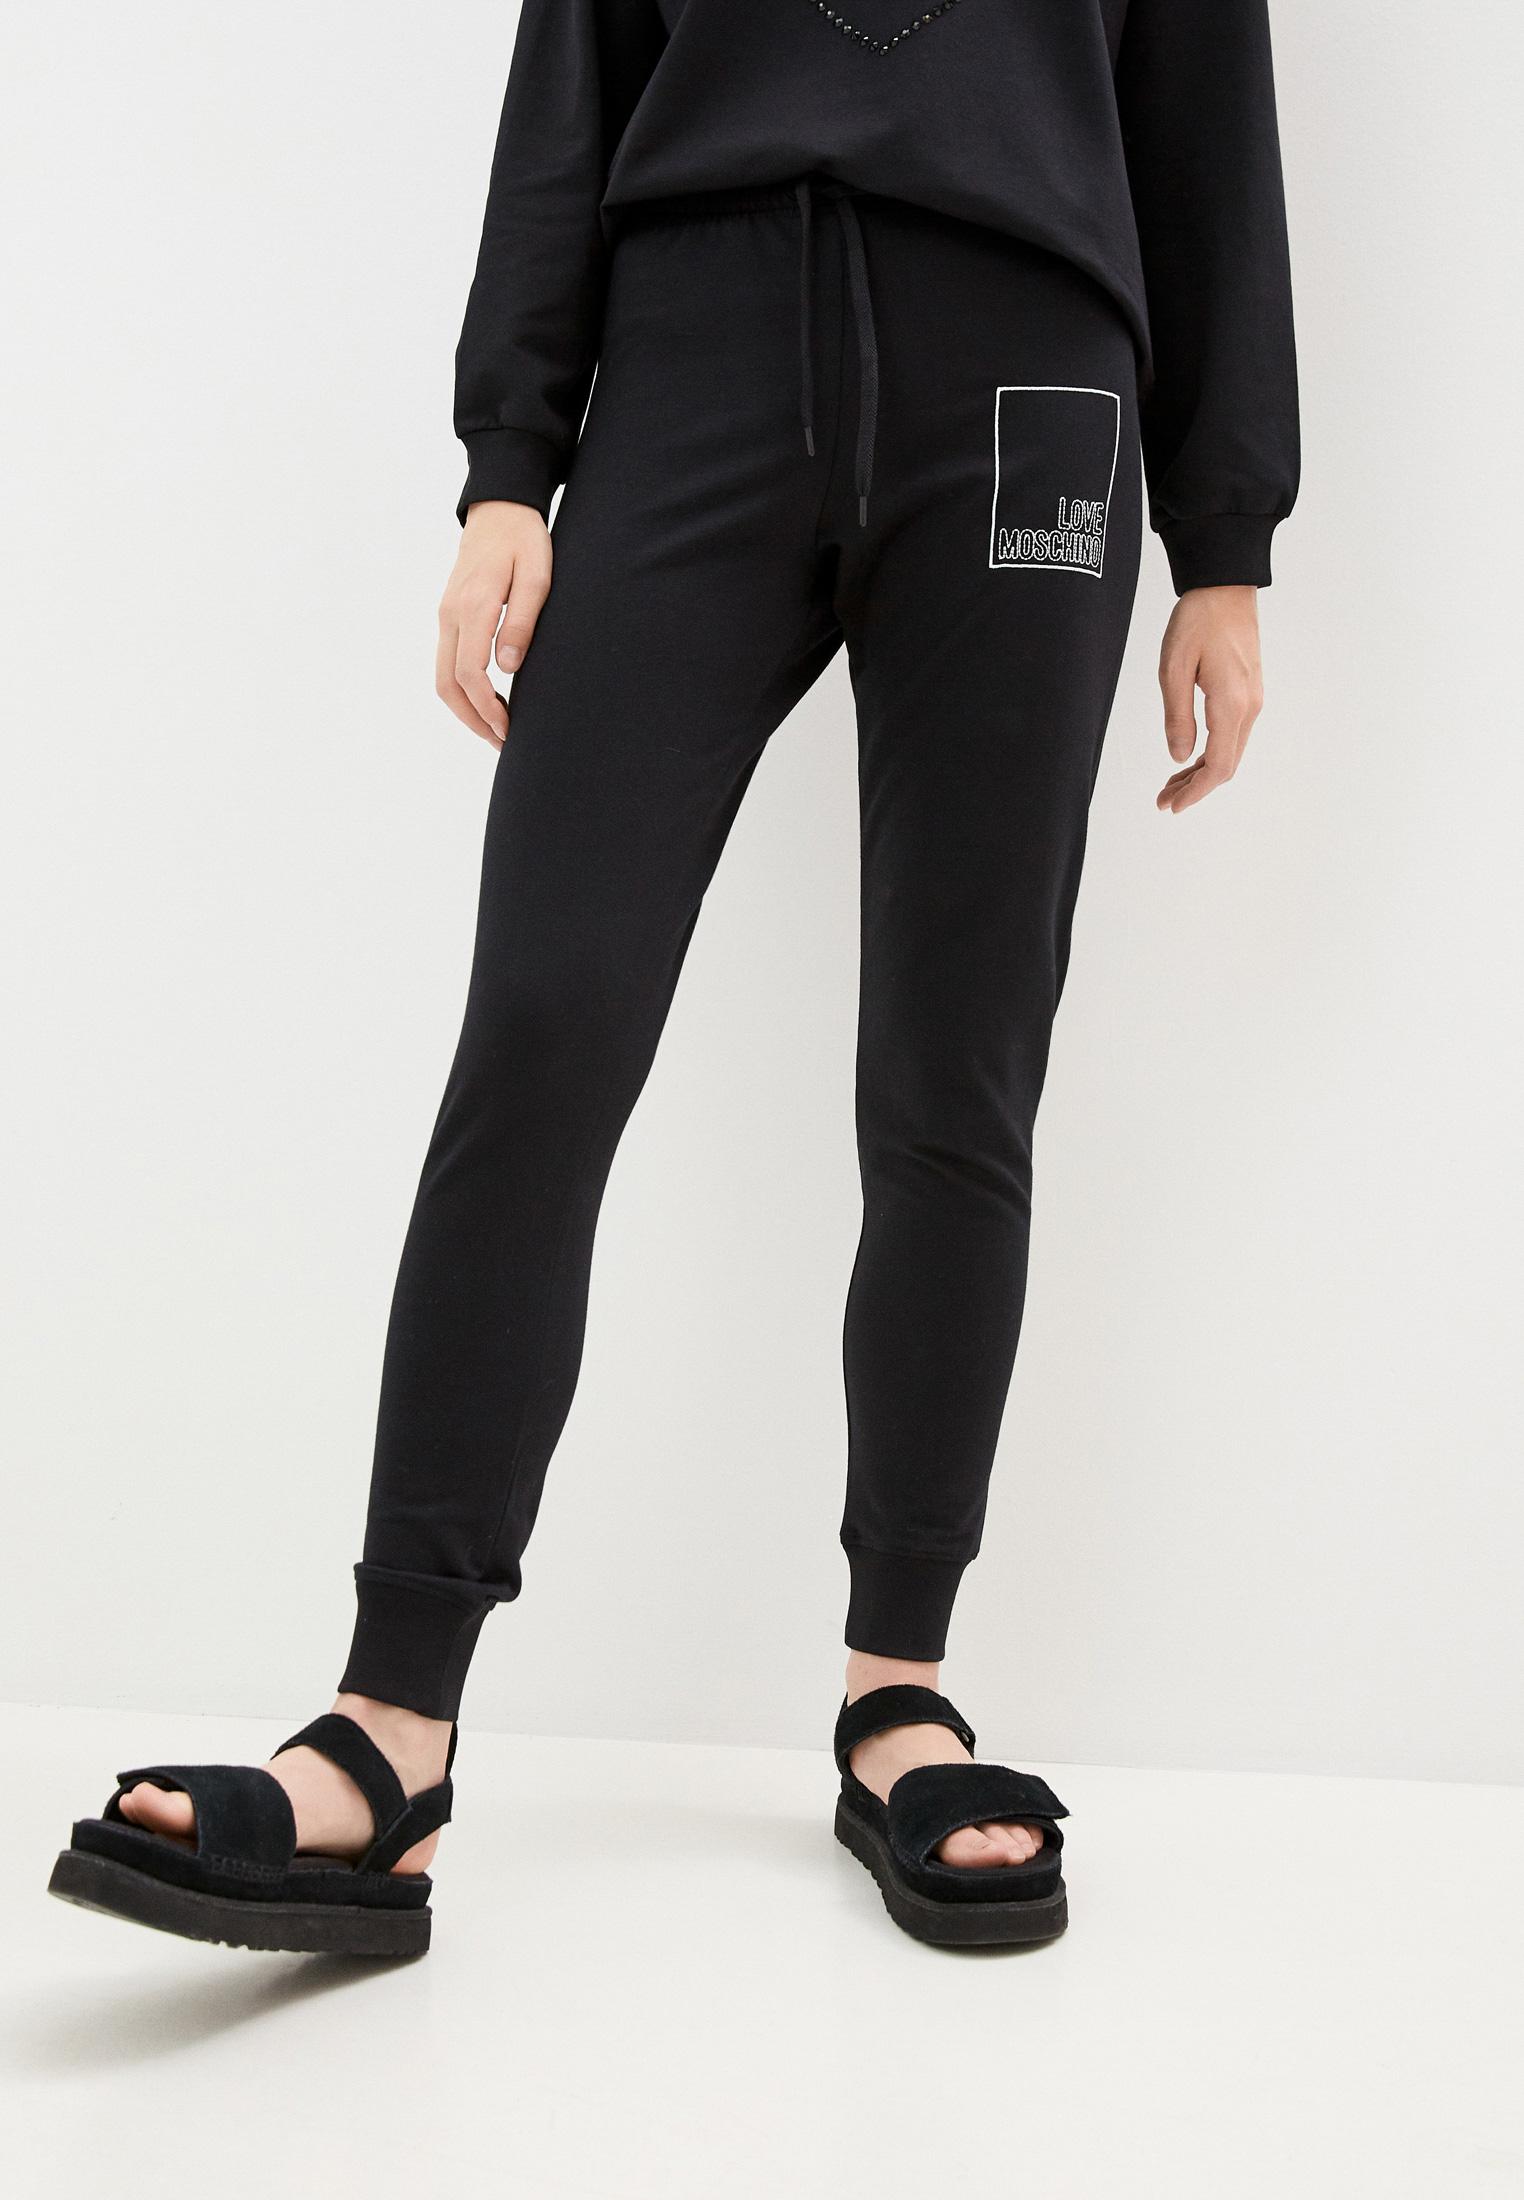 Женские спортивные брюки Love Moschino W 1 424 23 E 2269